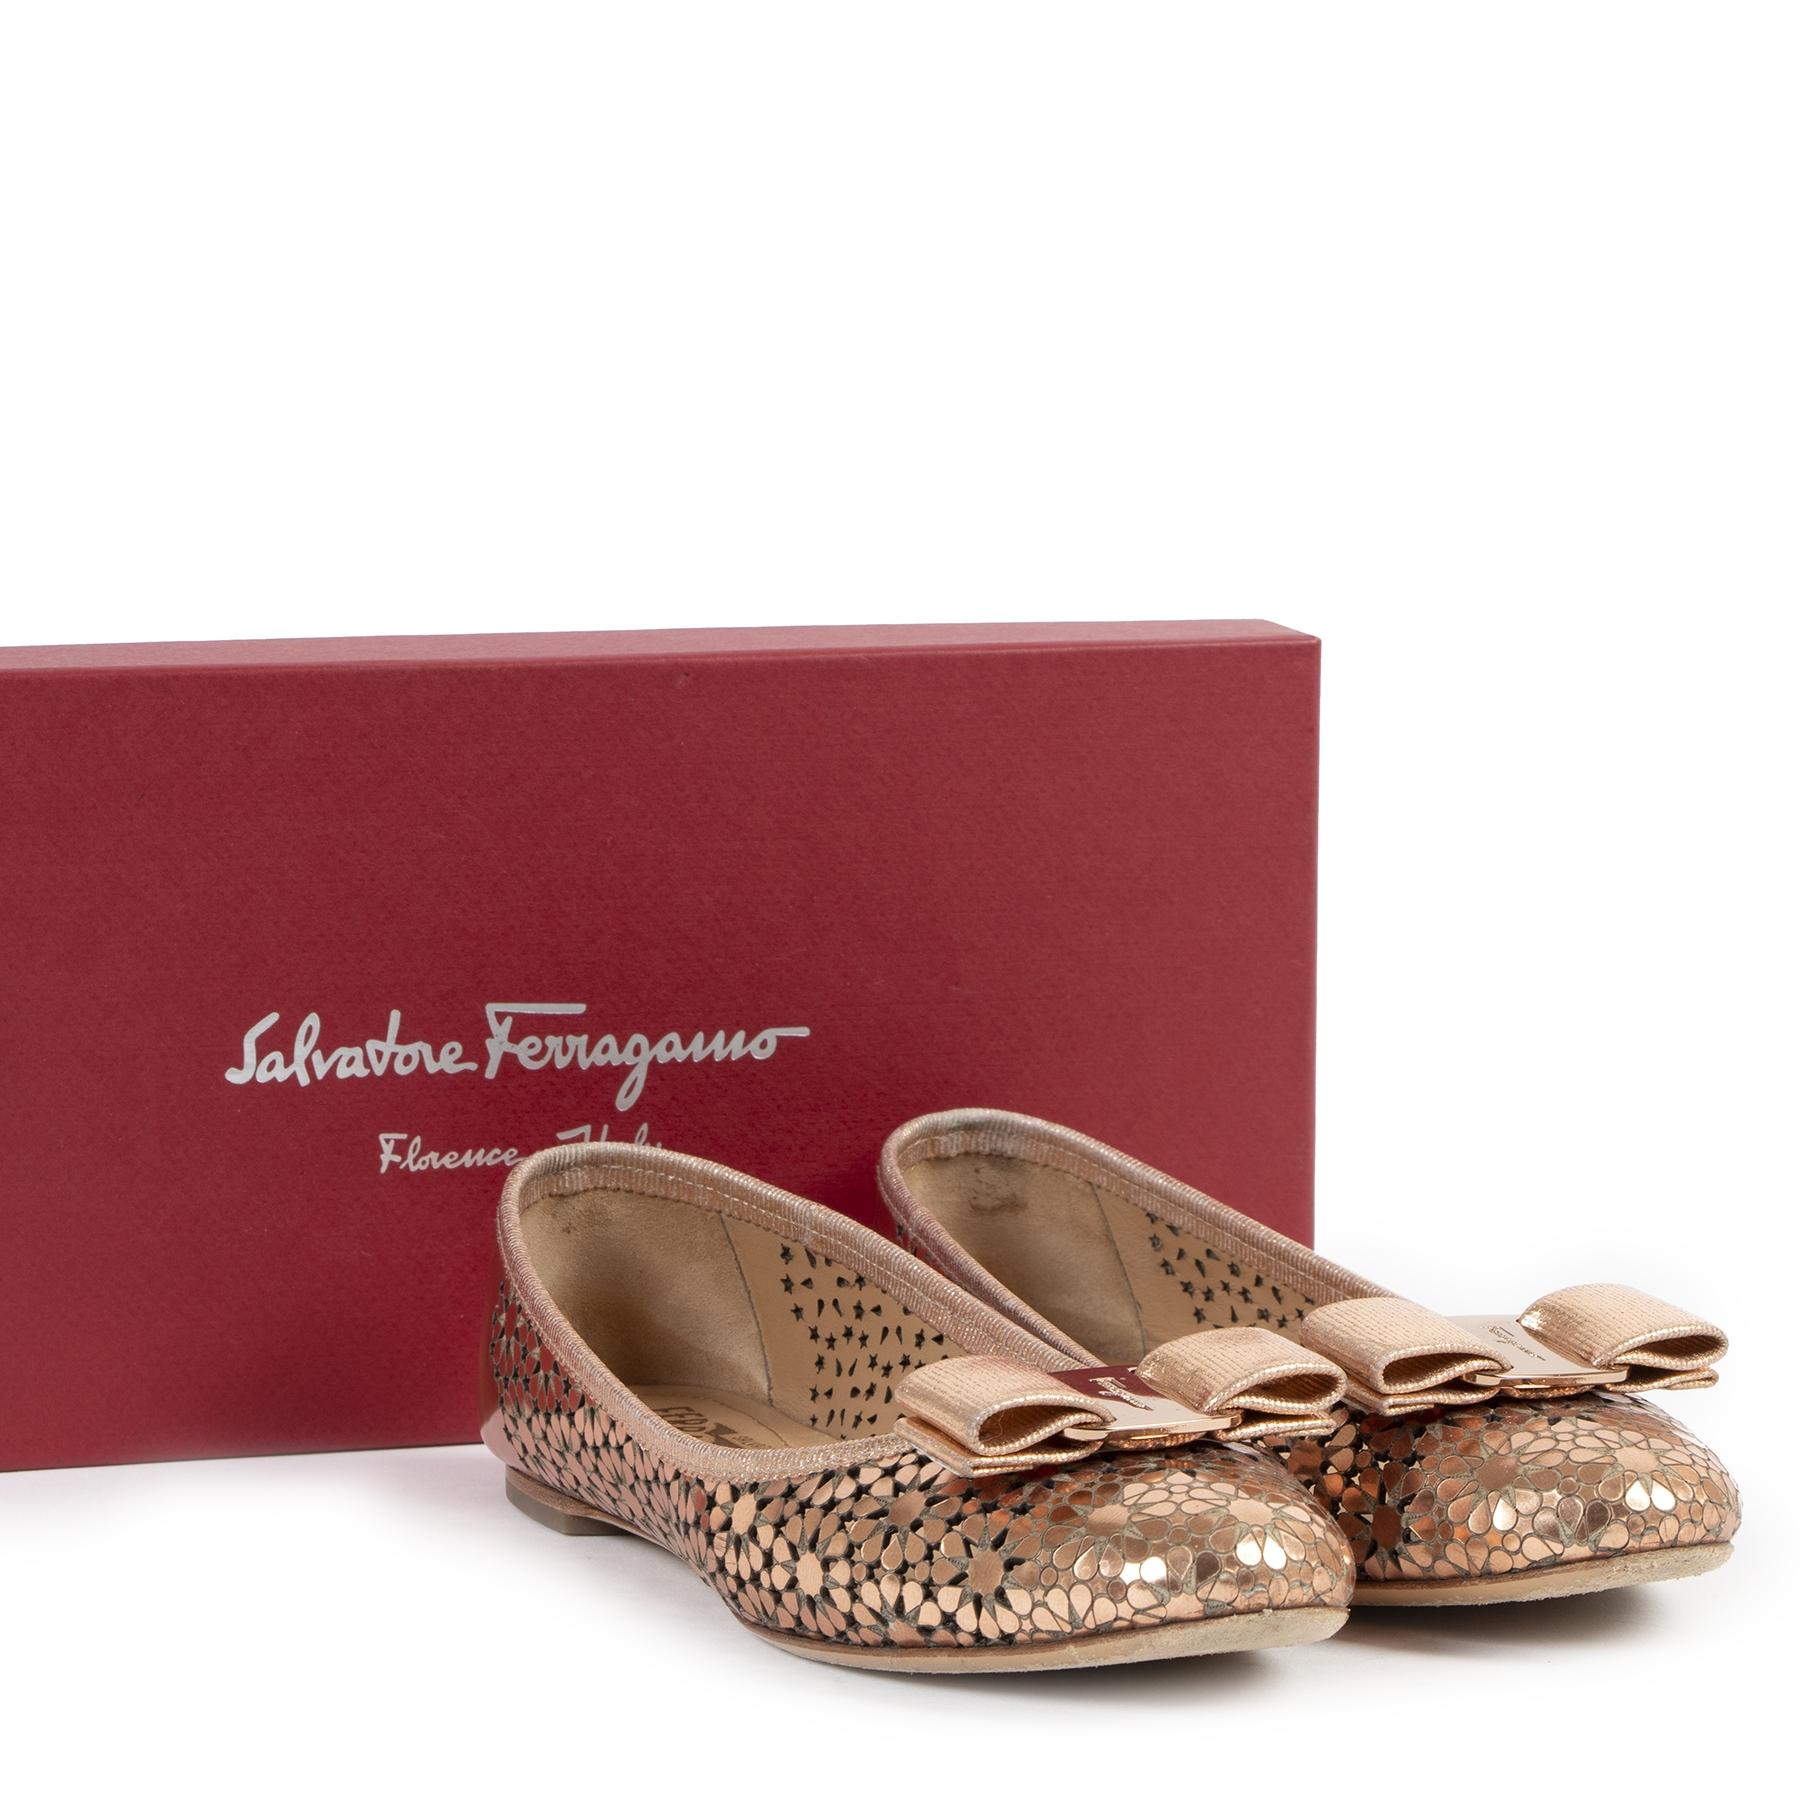 Authentic secondhand Salvatore Ferragamo Rose Gold Ballerinas - Size 38 designer shoes ballerina flats fashion luxury vintage webshop safe secure online shopping